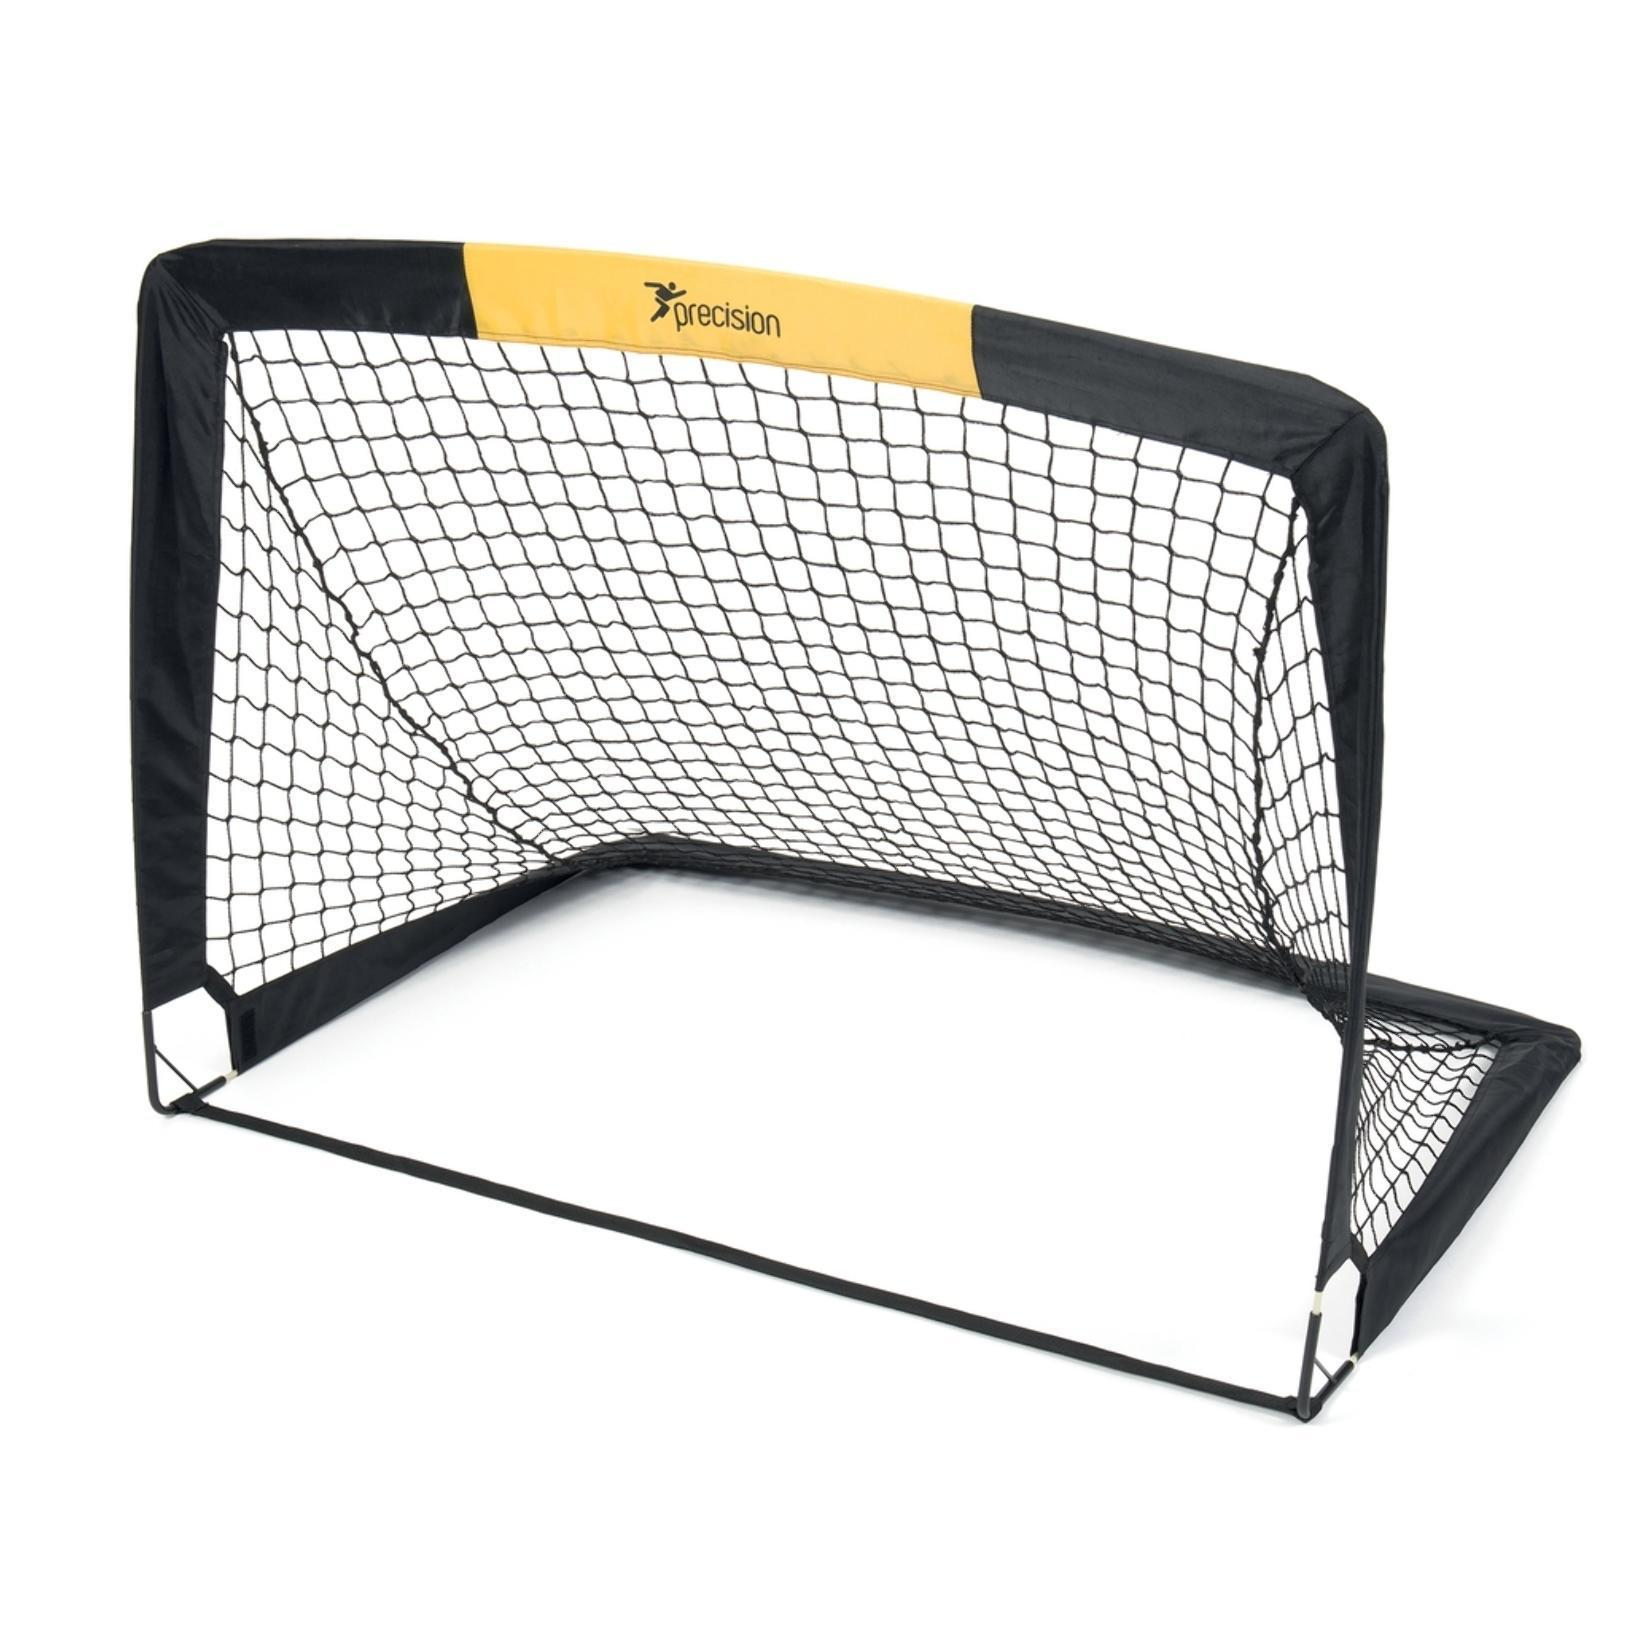 Precision Pop Up Football Goal (Pack of 2) (4.5ft x 3.5ft) (Black)